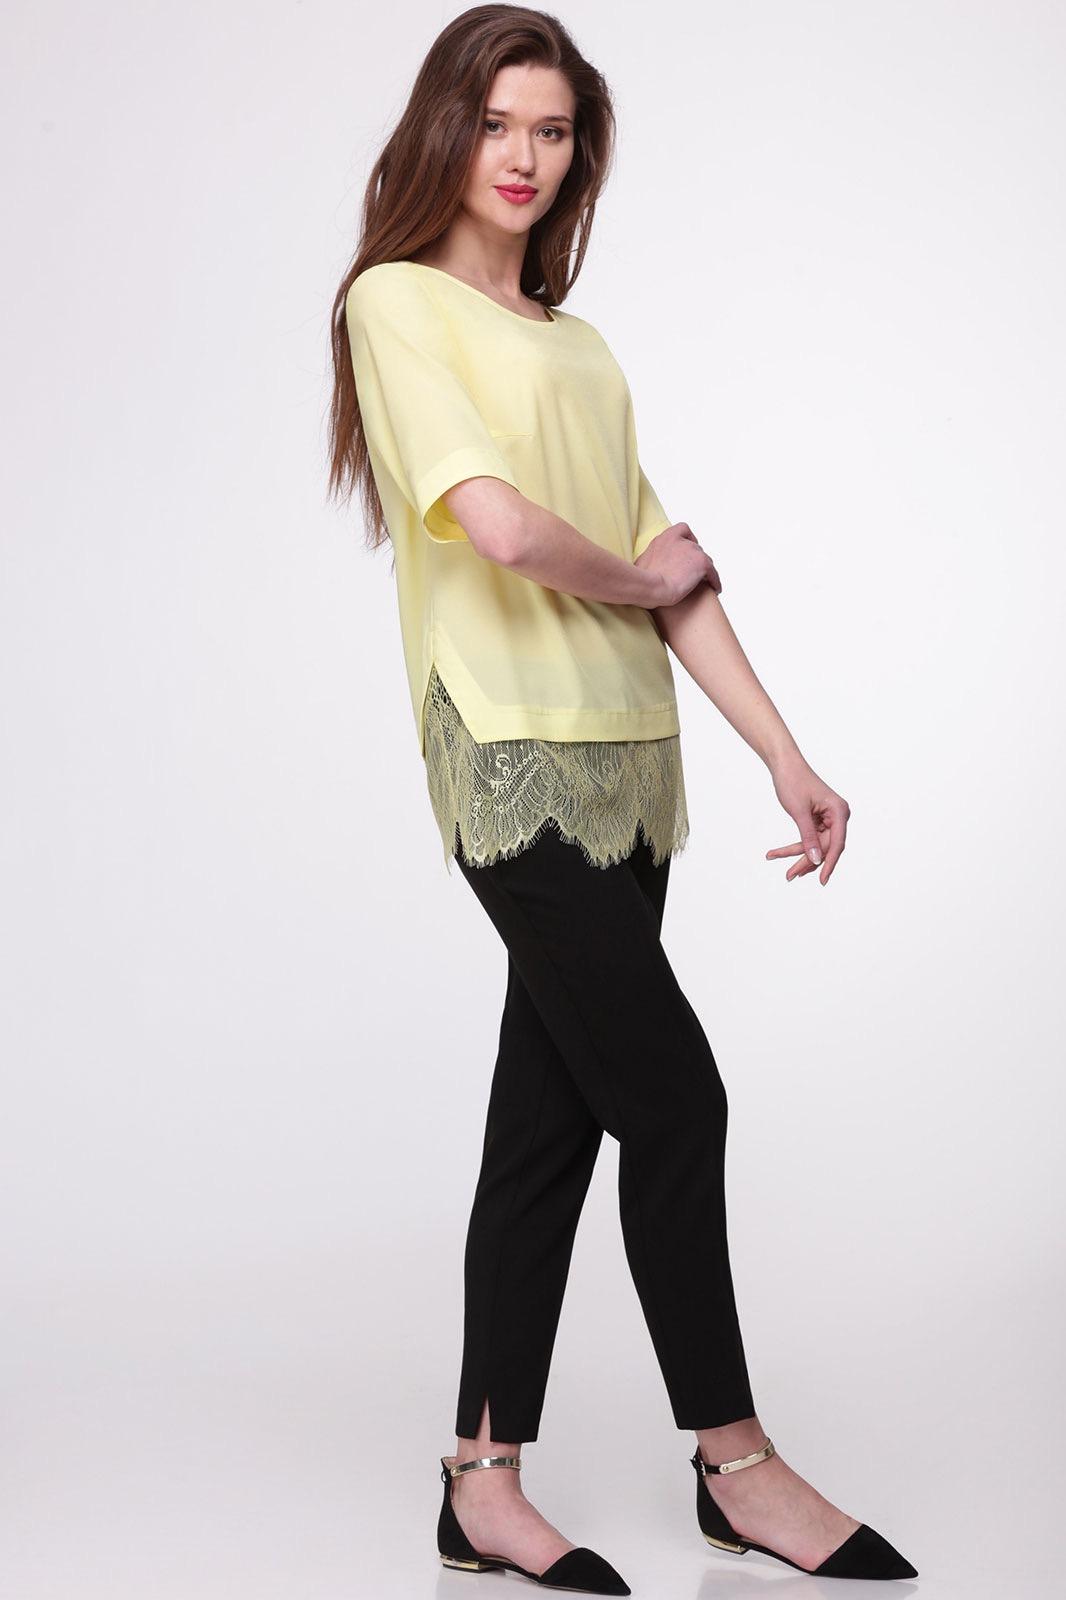 Блузка Faufilure 369С-1 желтые тона - фото 2